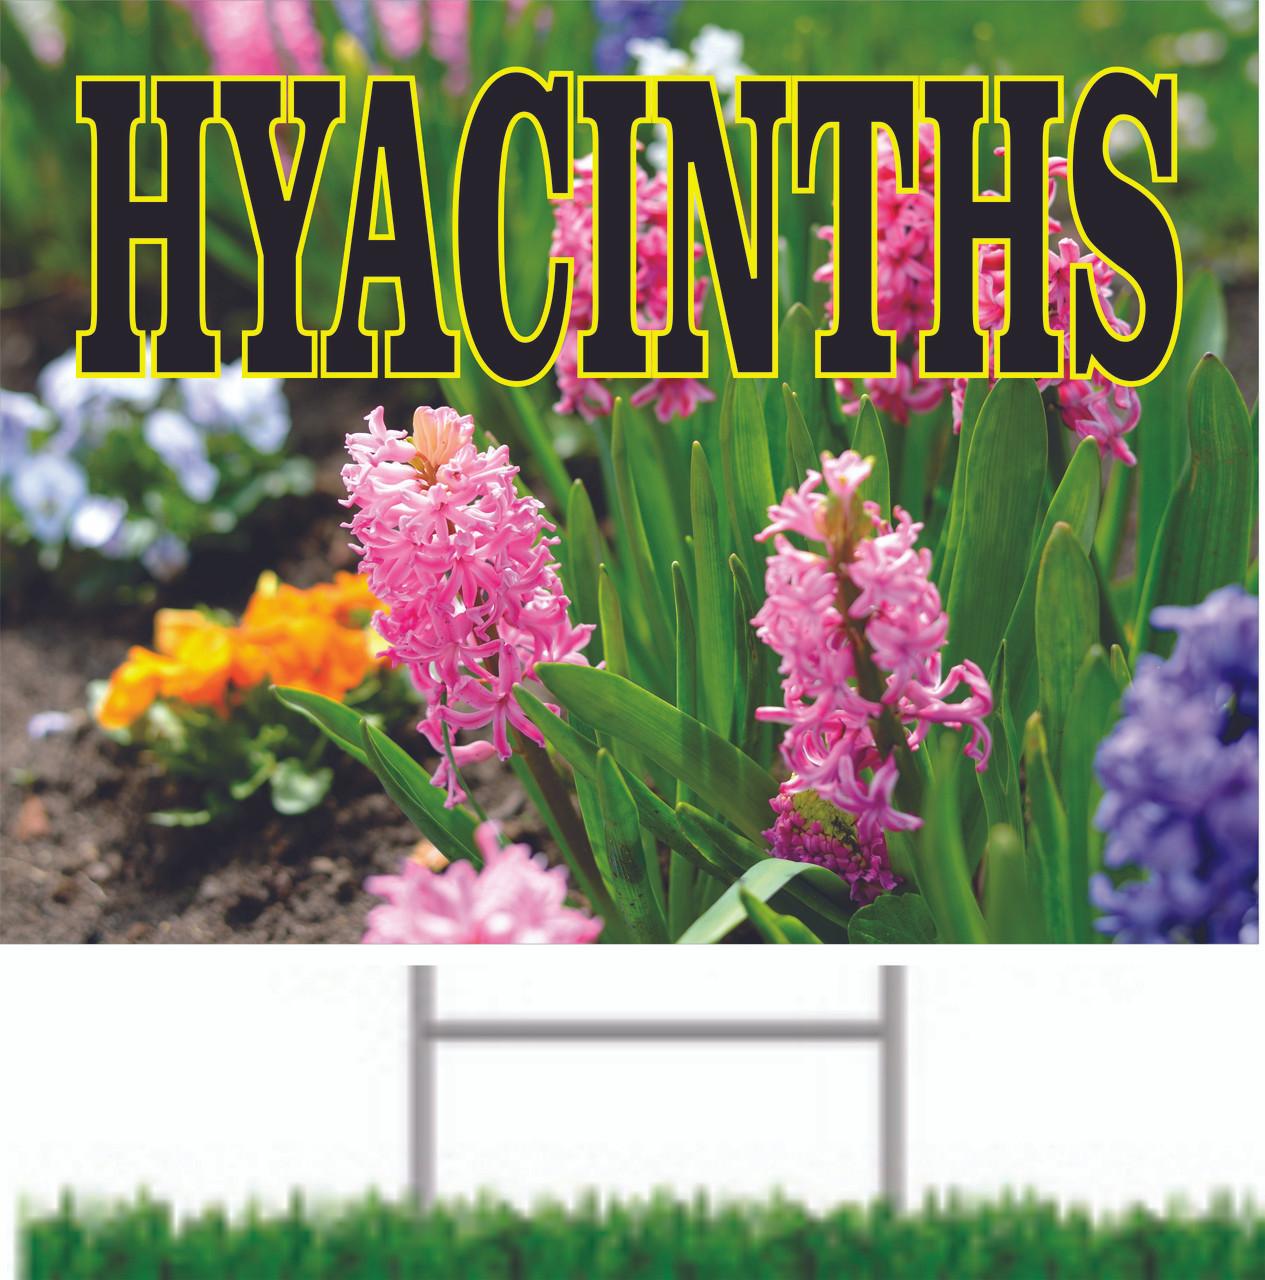 Hyacinths Road/Yard Bring in New Customers.